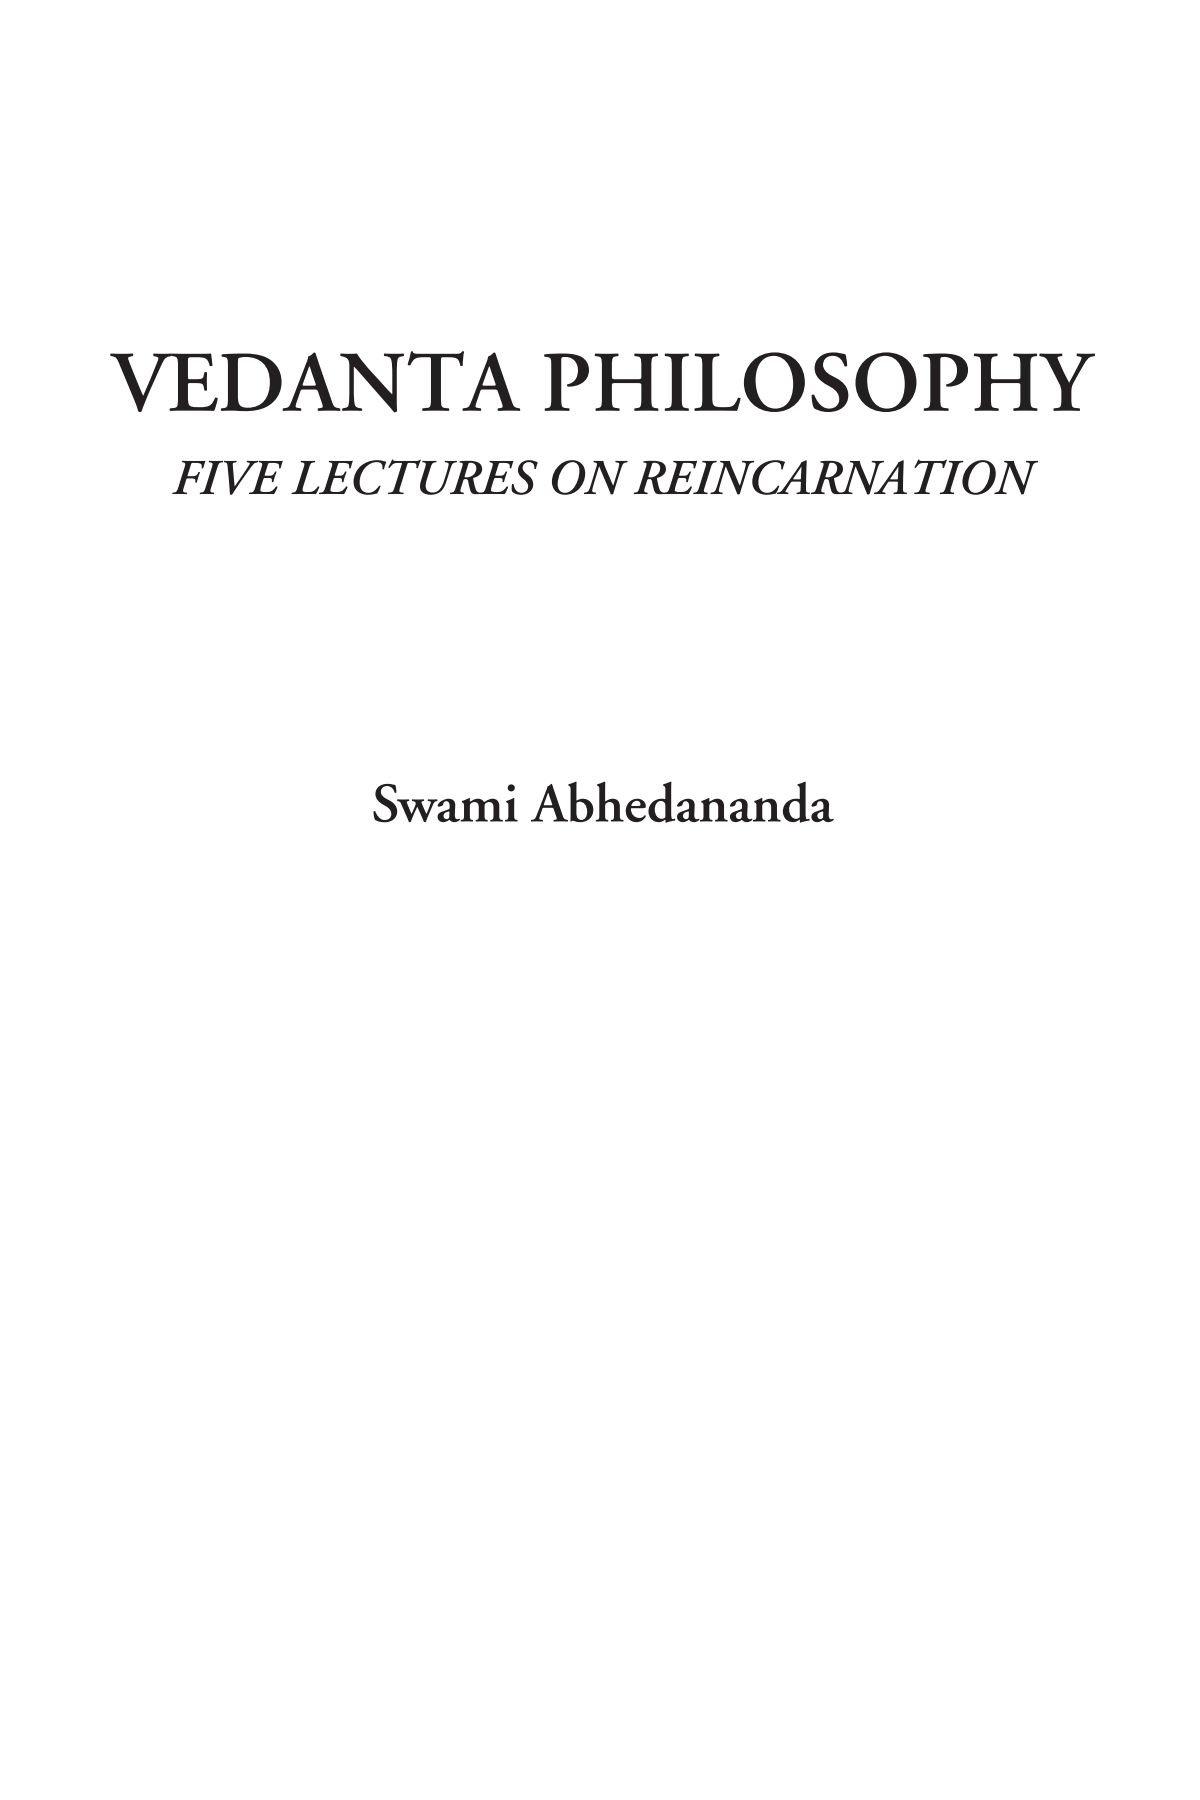 Download Vedanta Philosophy (Five Lectures on Reincarnation) PDF